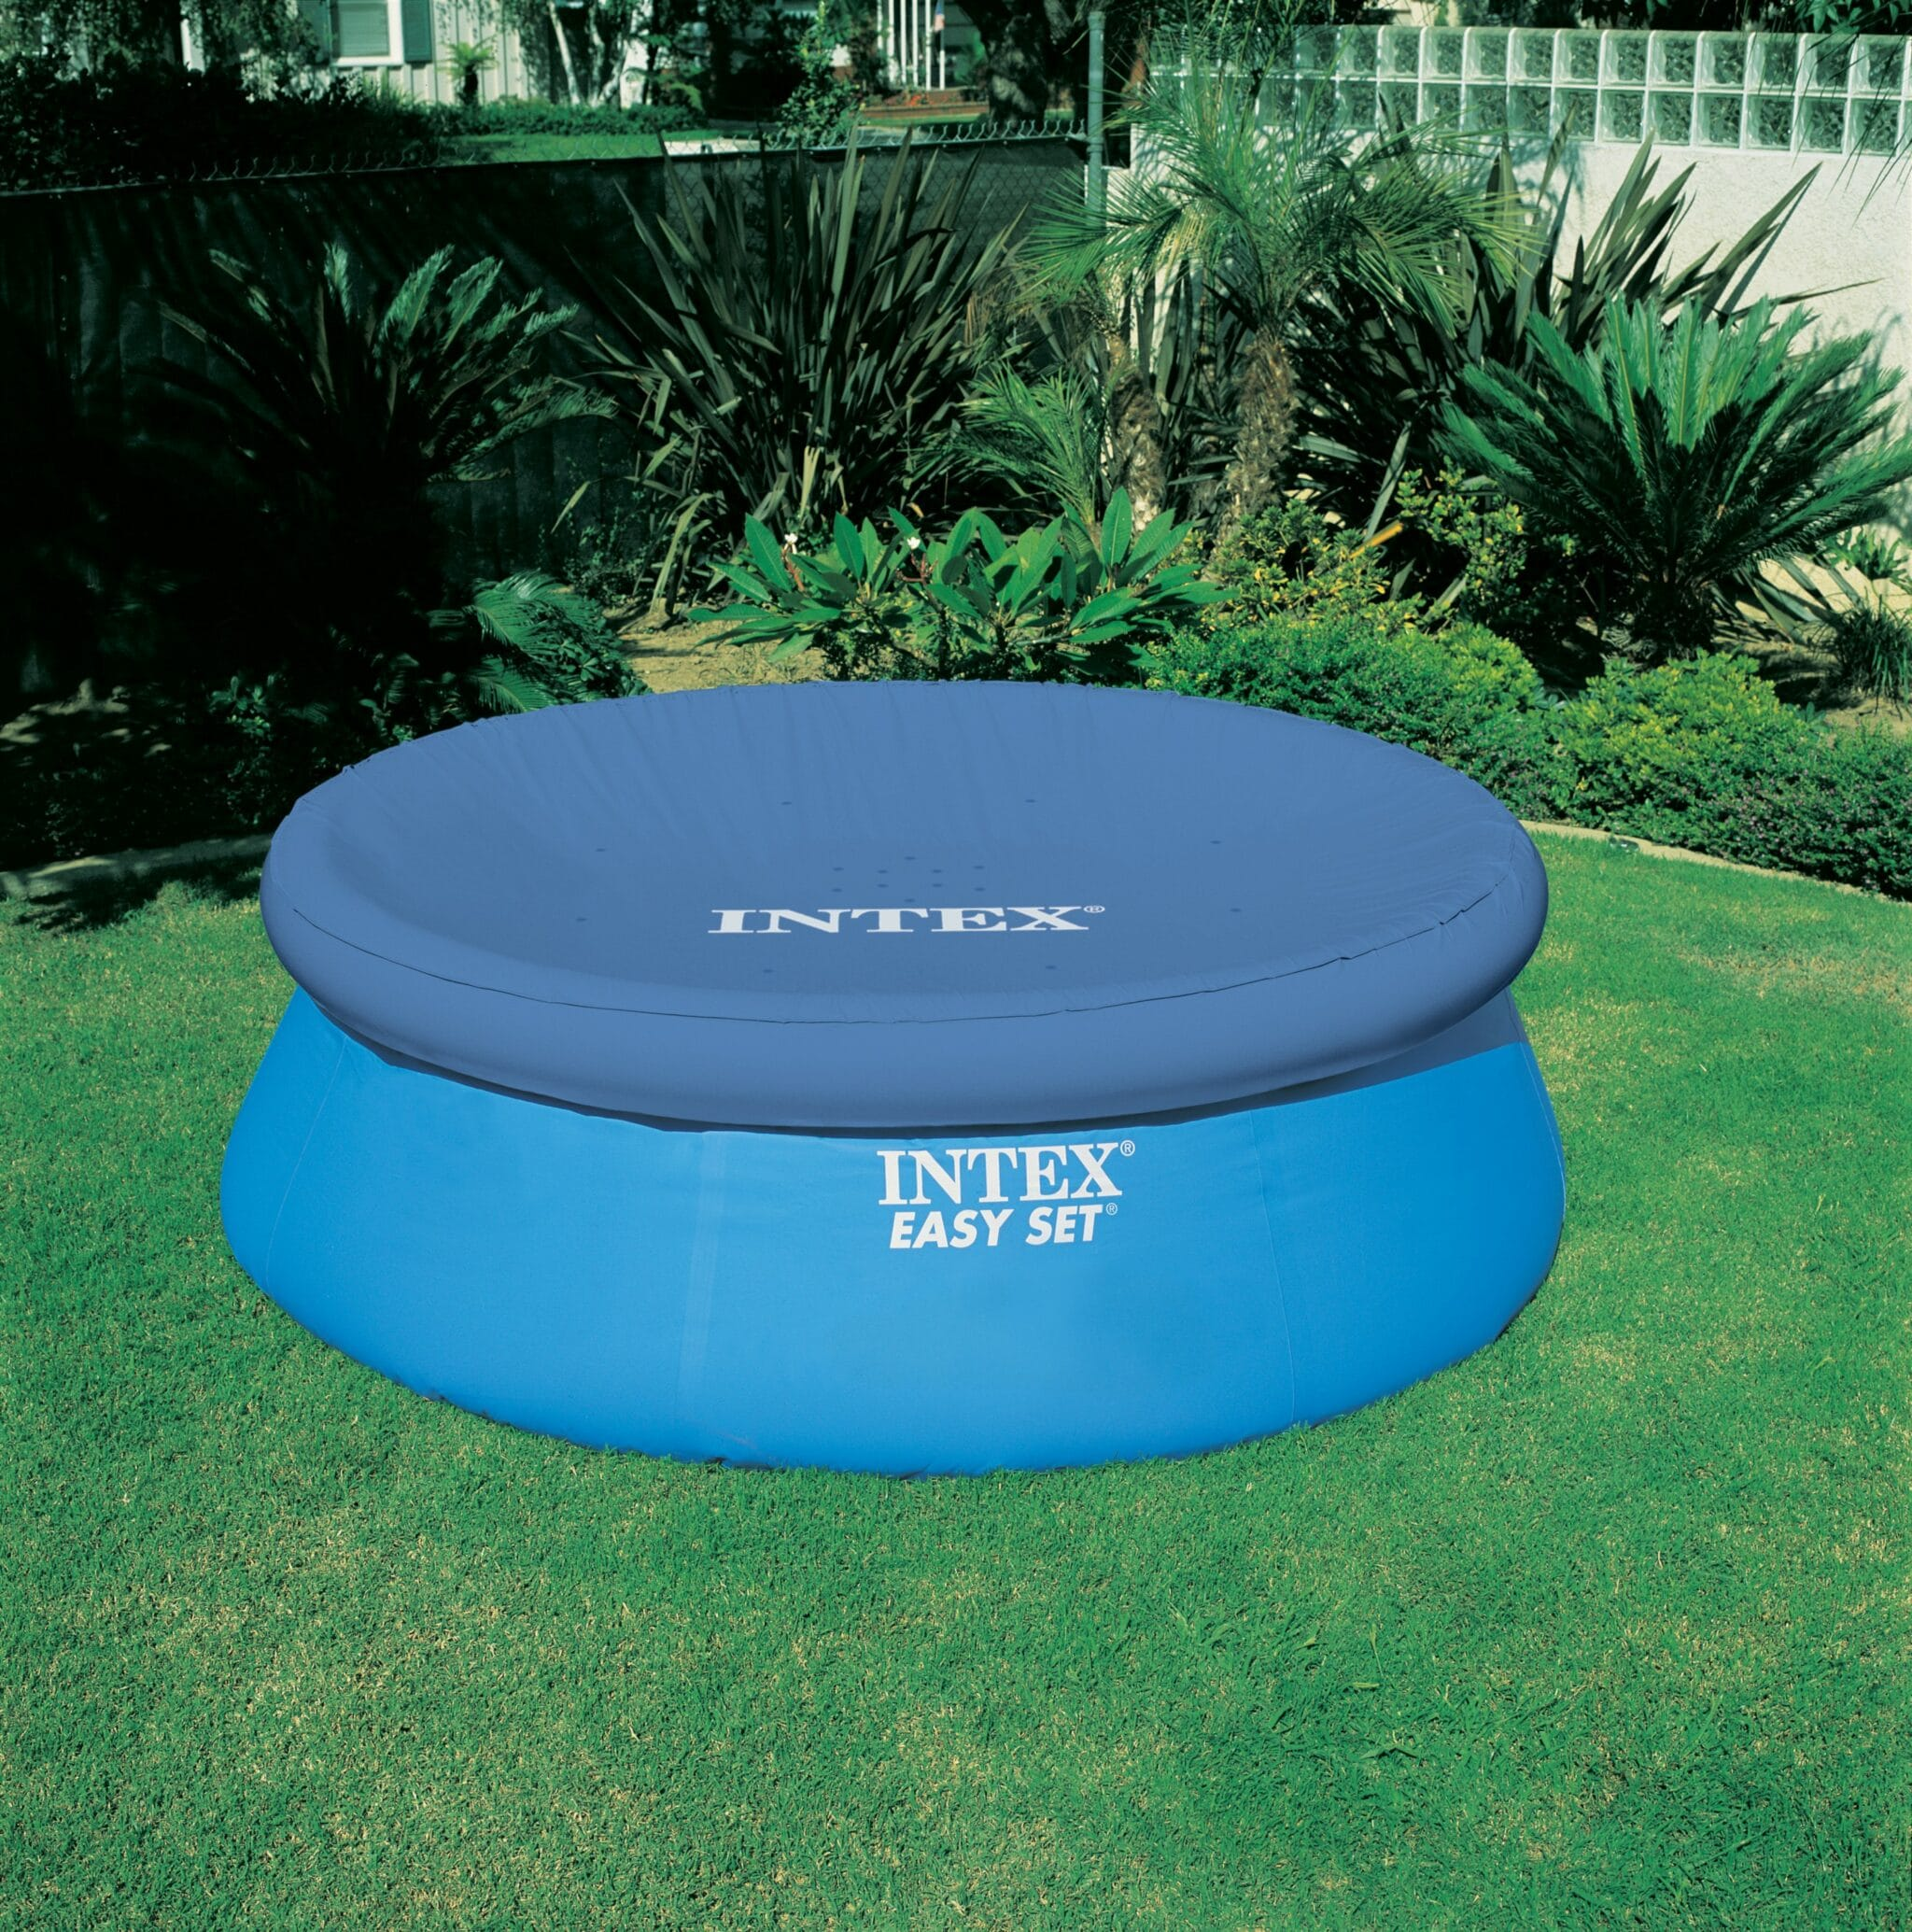 Intex Easy Set Pool 457 x 91 cm mit Filteranlage 54914GS